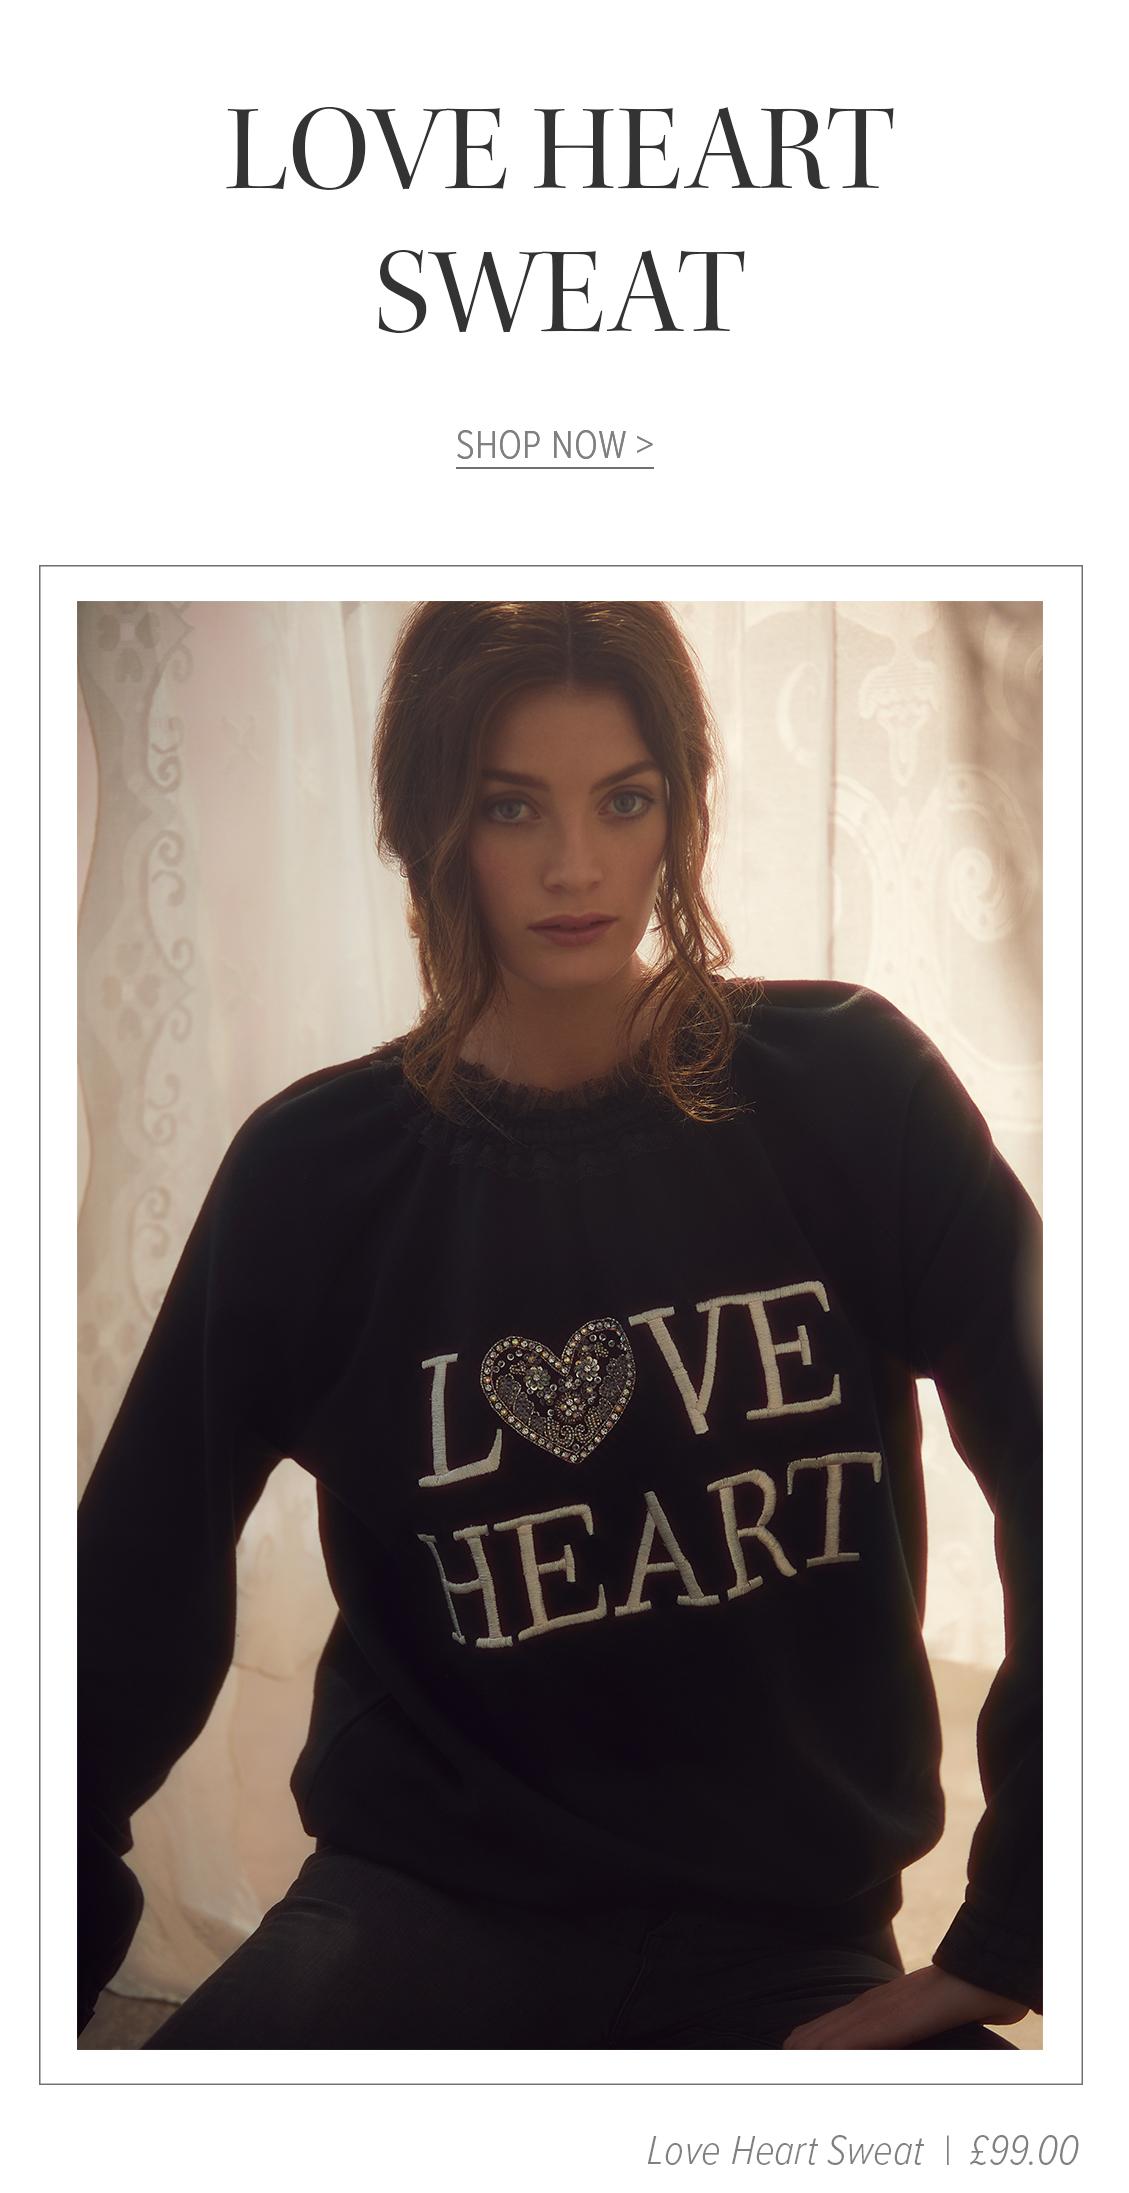 Love Heart Sweat